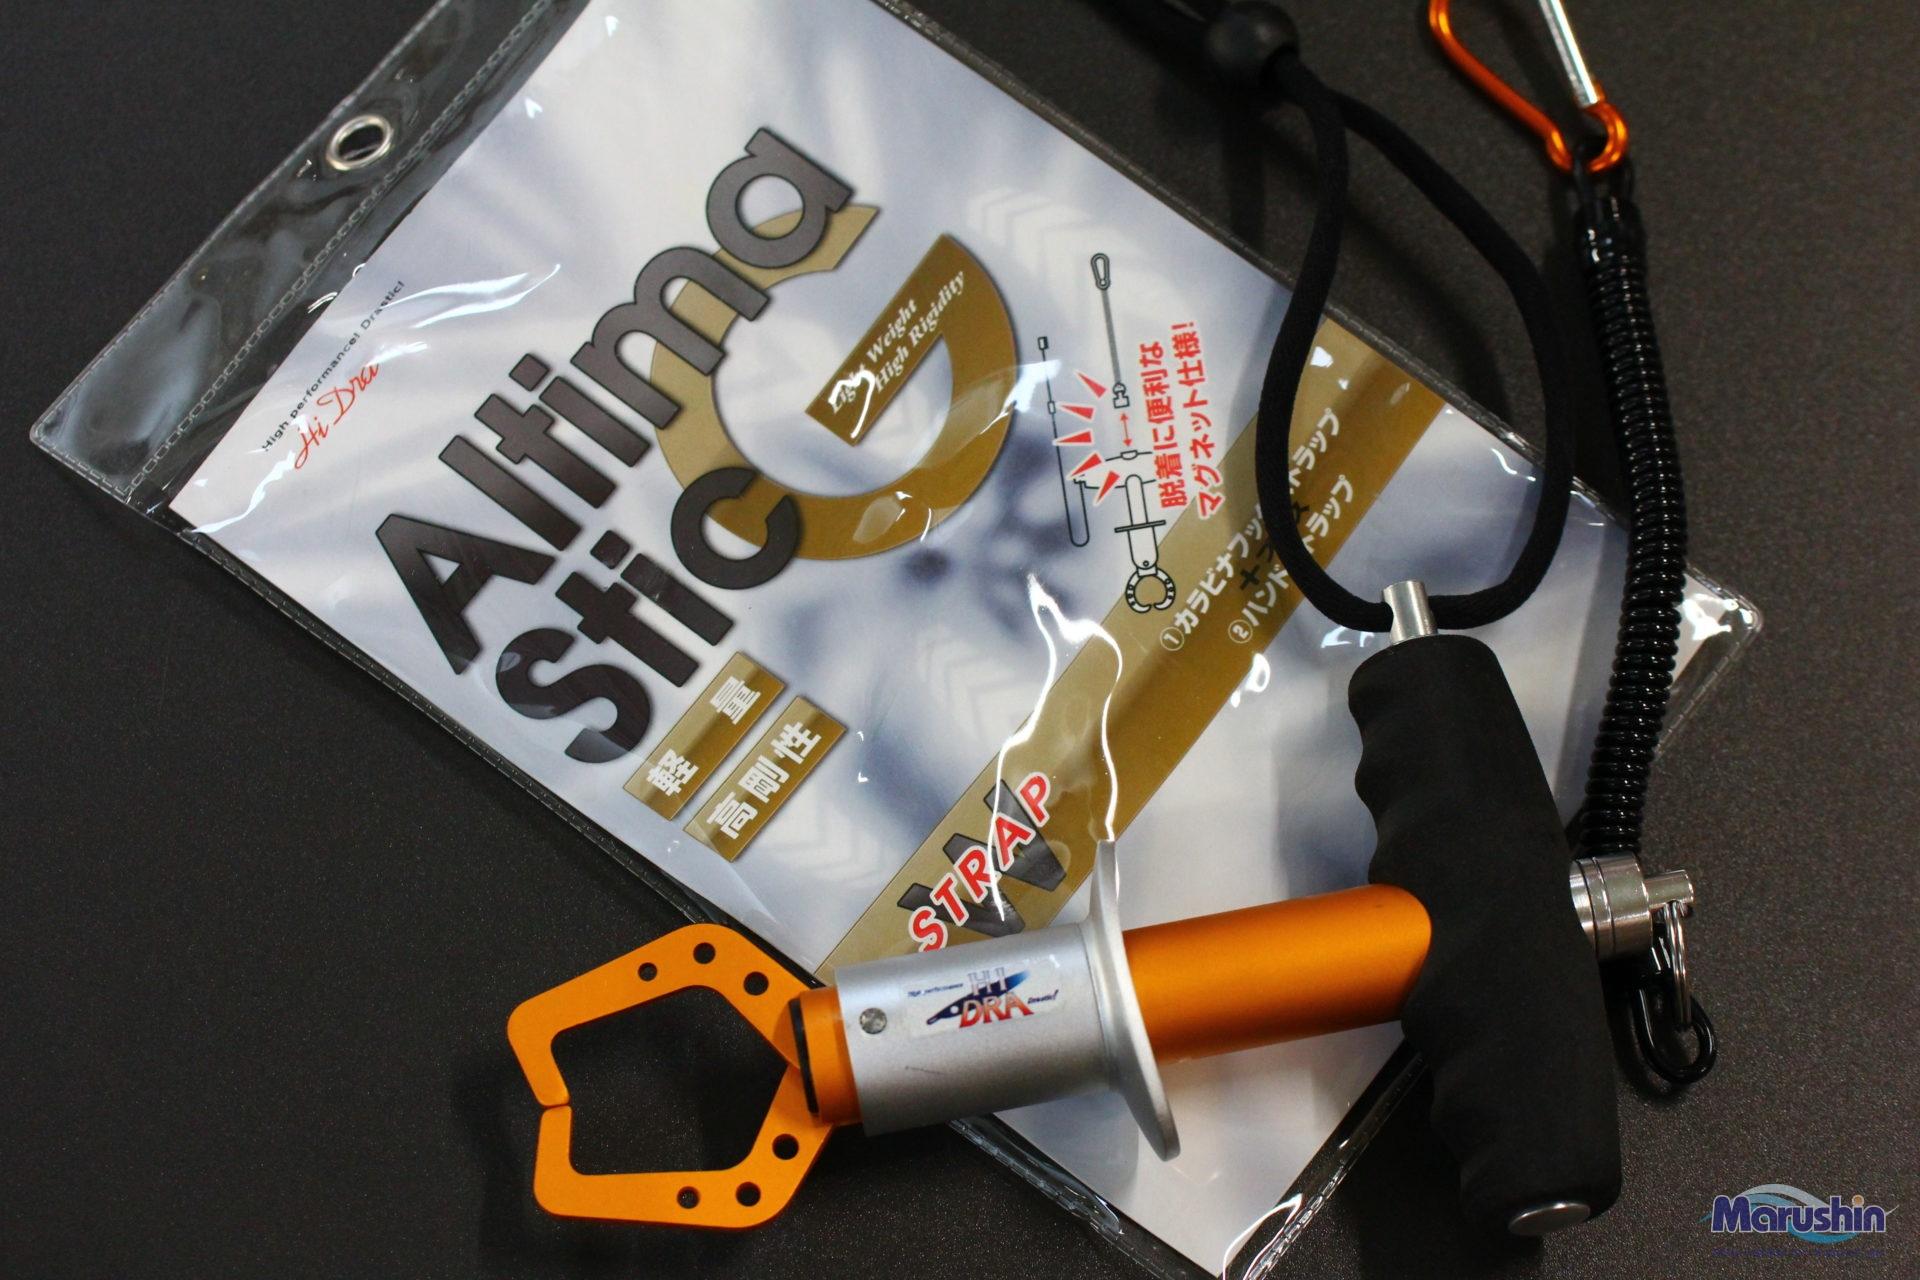 AltimaStic G (アルティマスティックG)イメージ画像